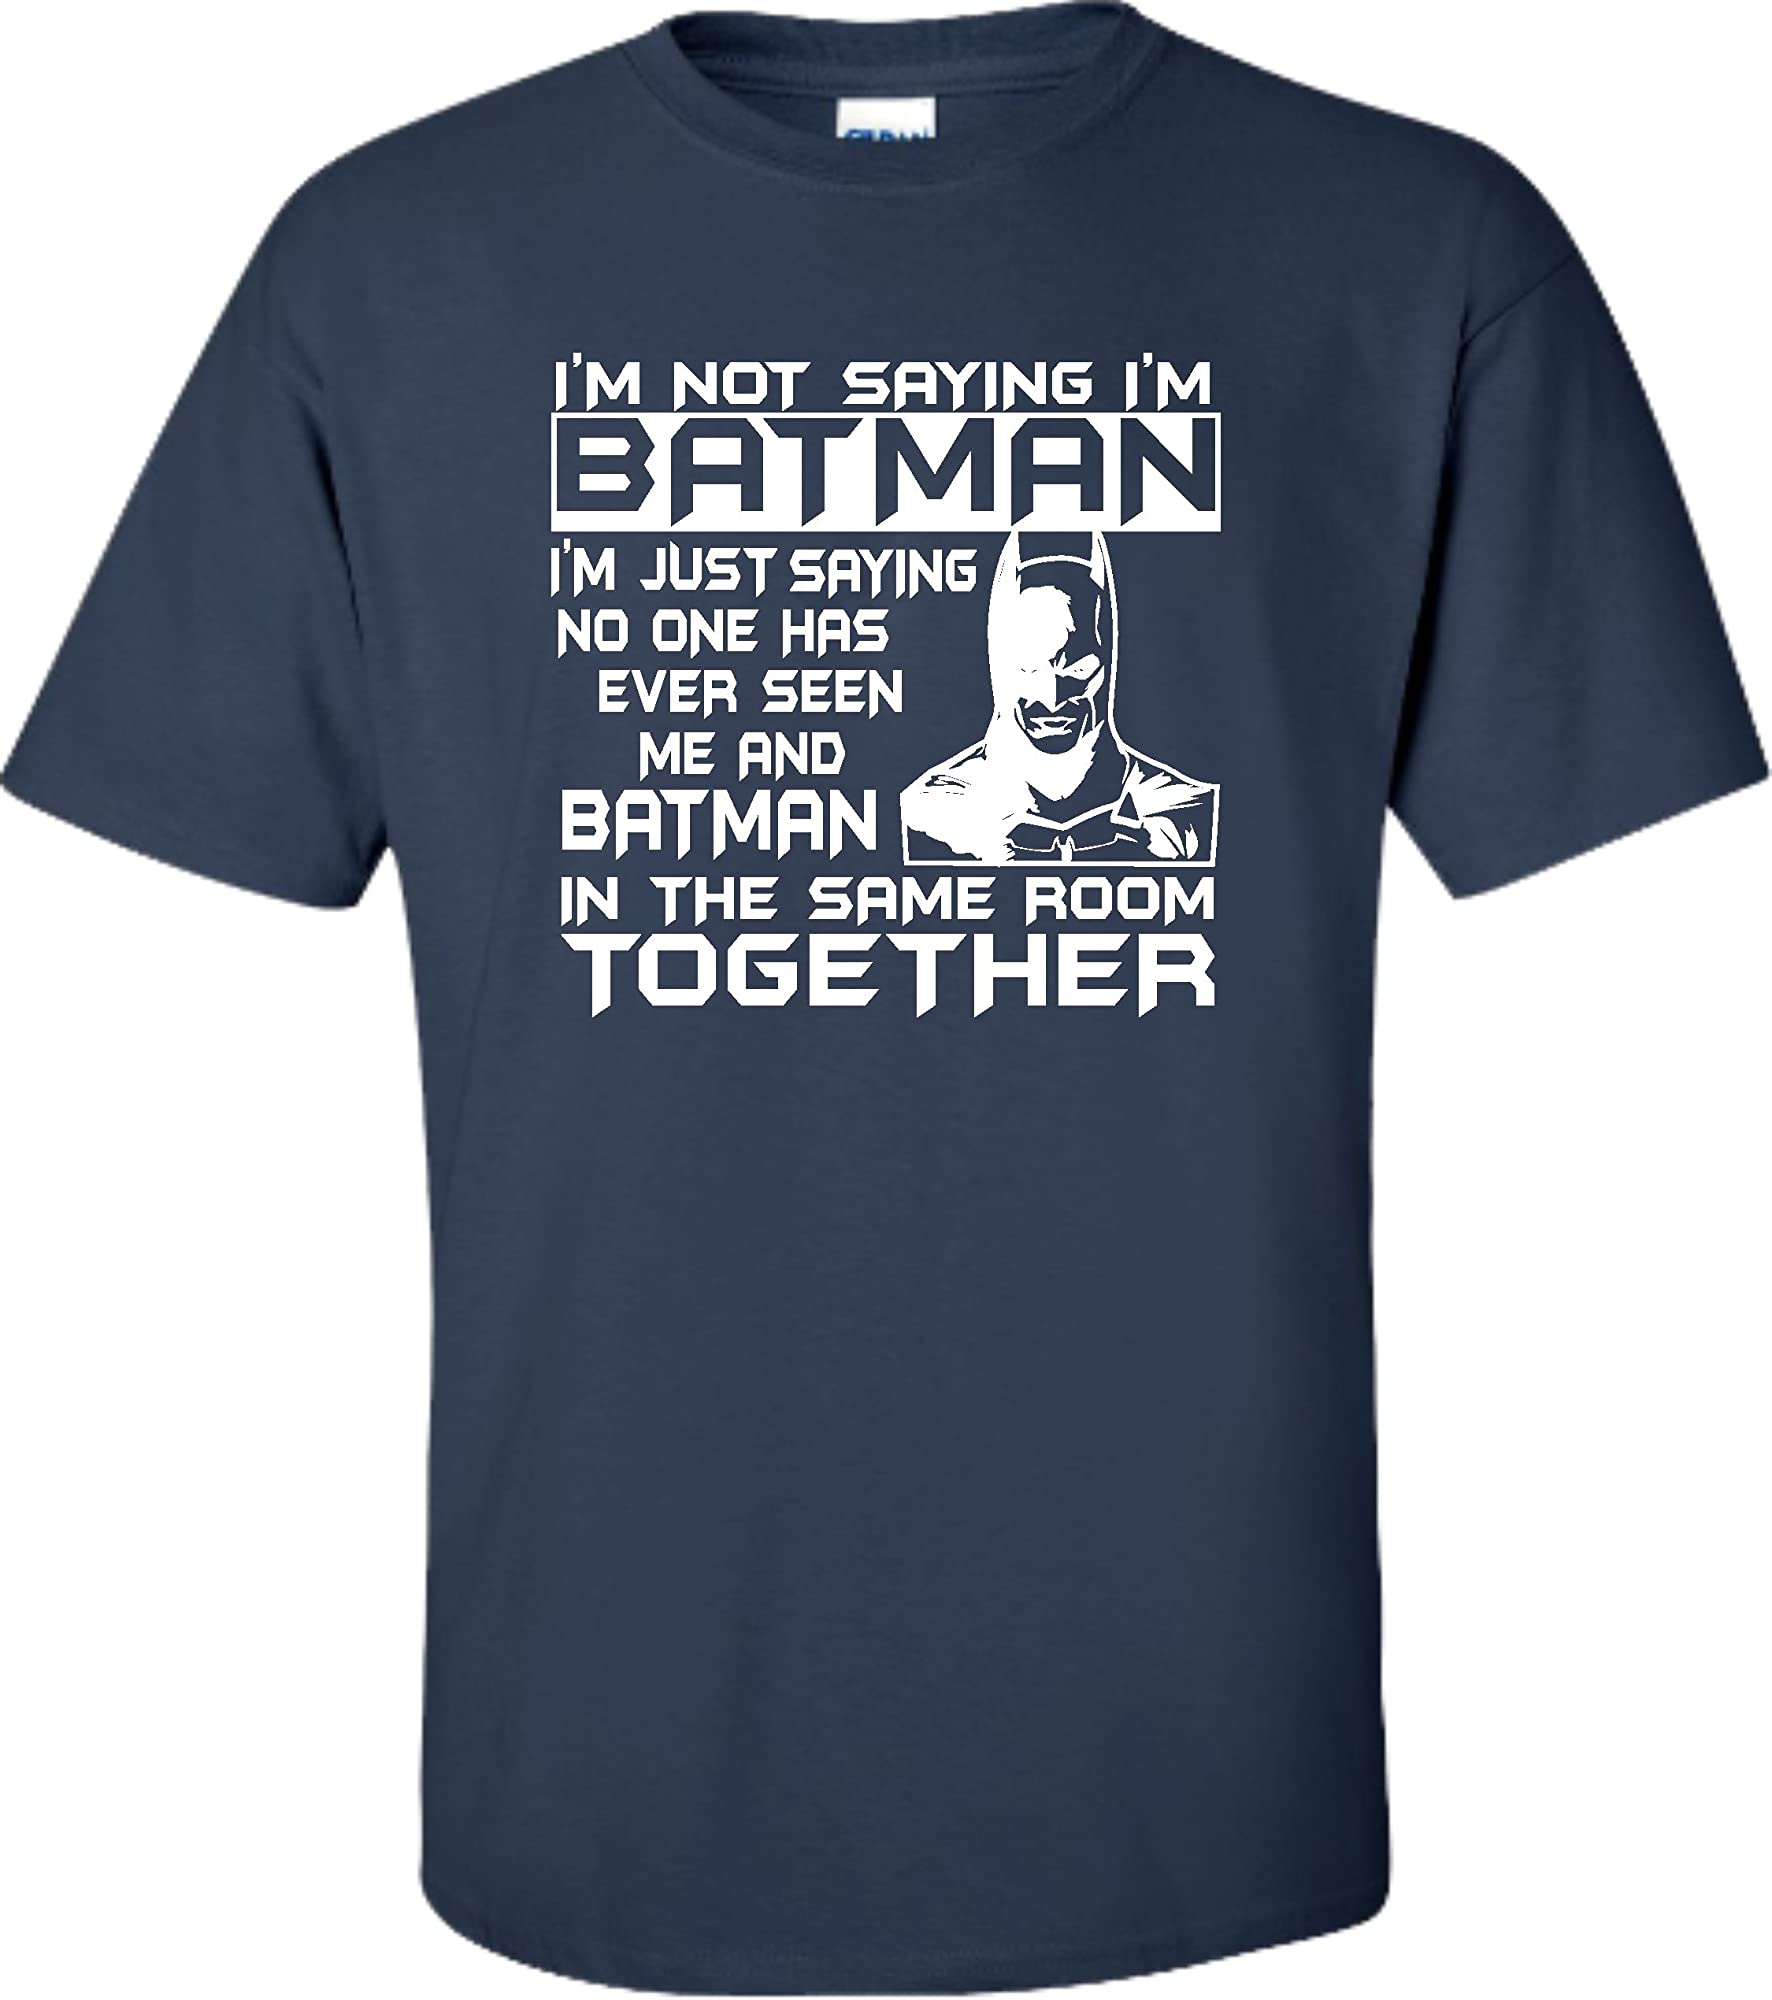 X Navy Blue Adult I'm Not Saying I'm Batman Funny T Shirt